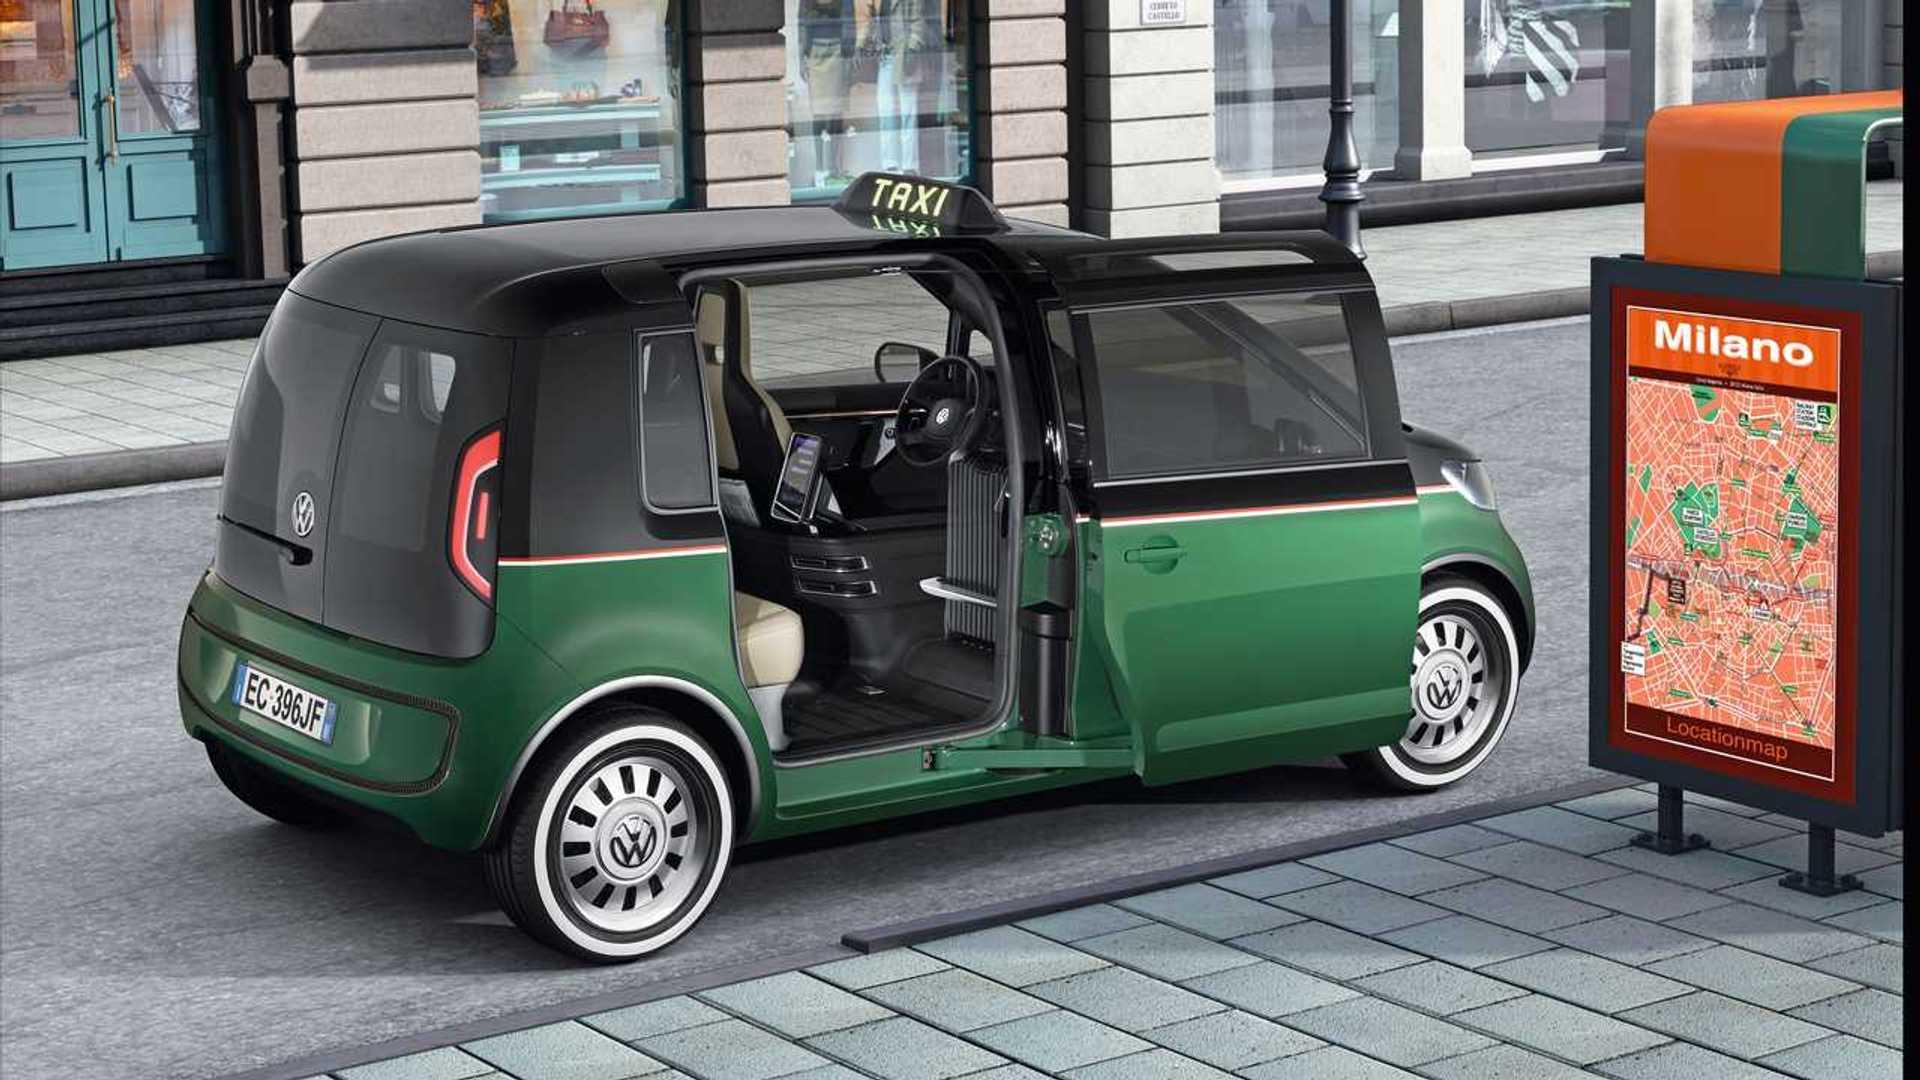 https://cdn.motor1.com/images/mgl/WOkKq/s6/vw-milano-taxi.jpg